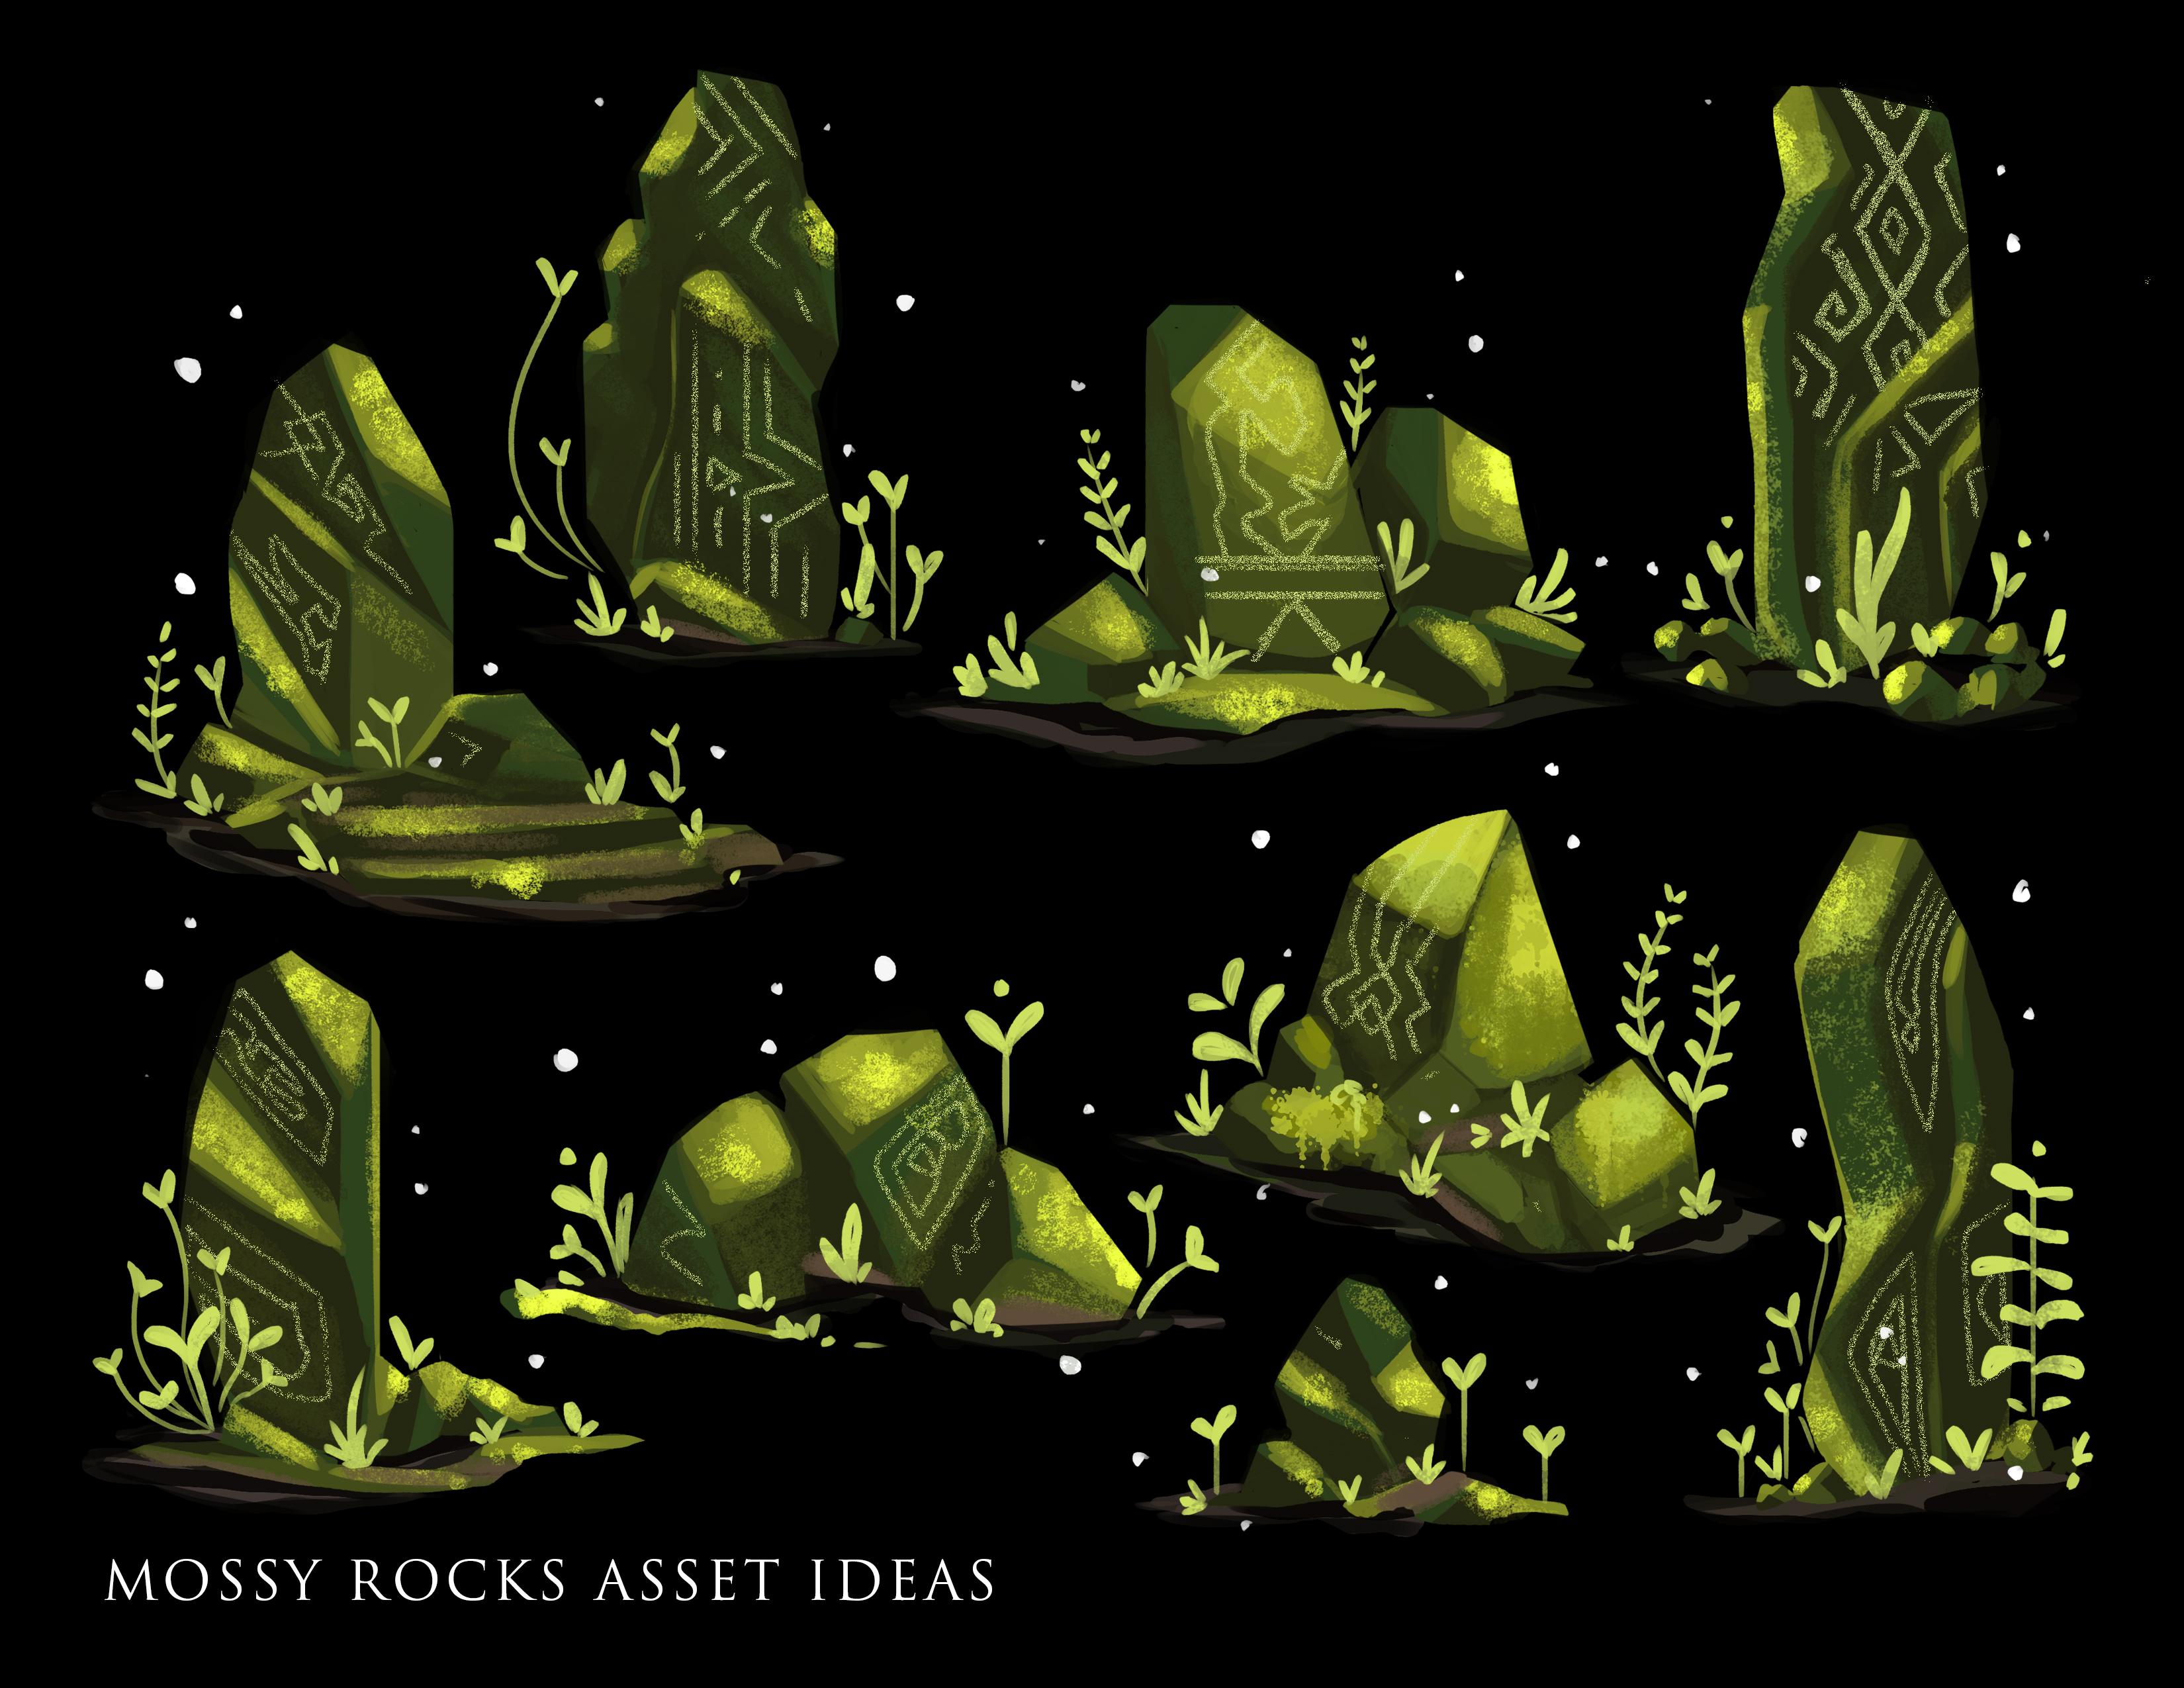 mossy rocks asset concepts